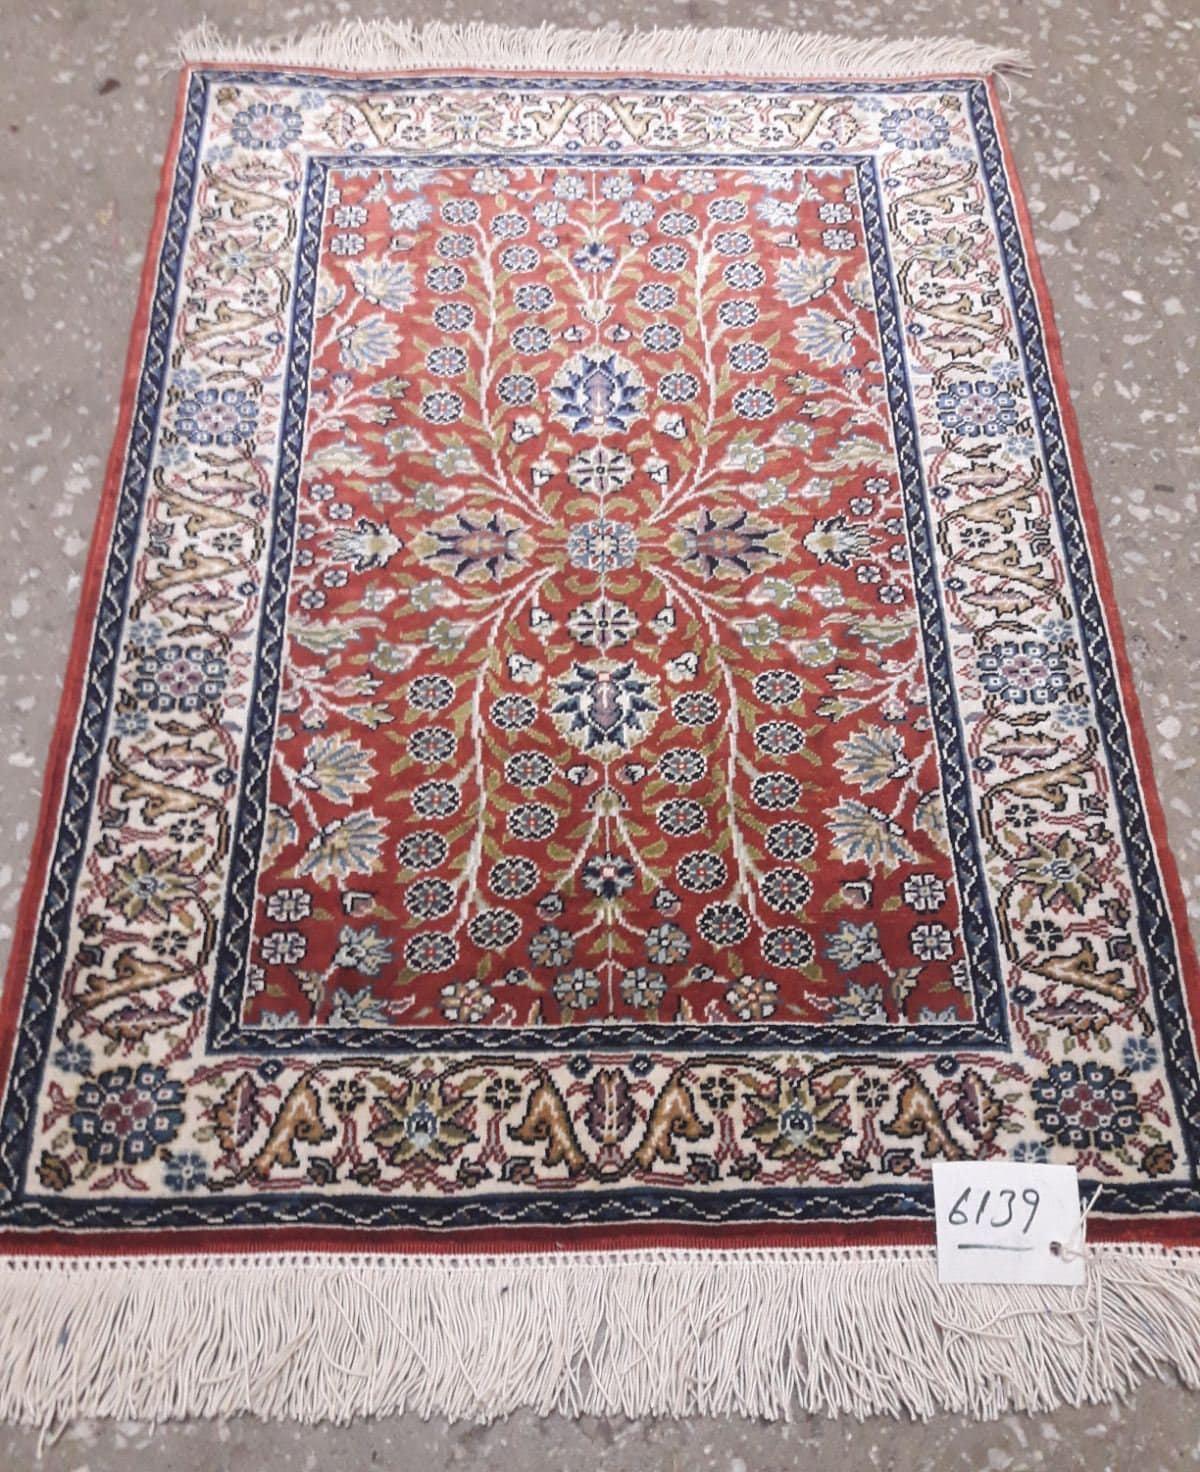 Pure Silk Rug Silk Carpet Turkish Rug 1.64 X 2.23 Ft 0.50